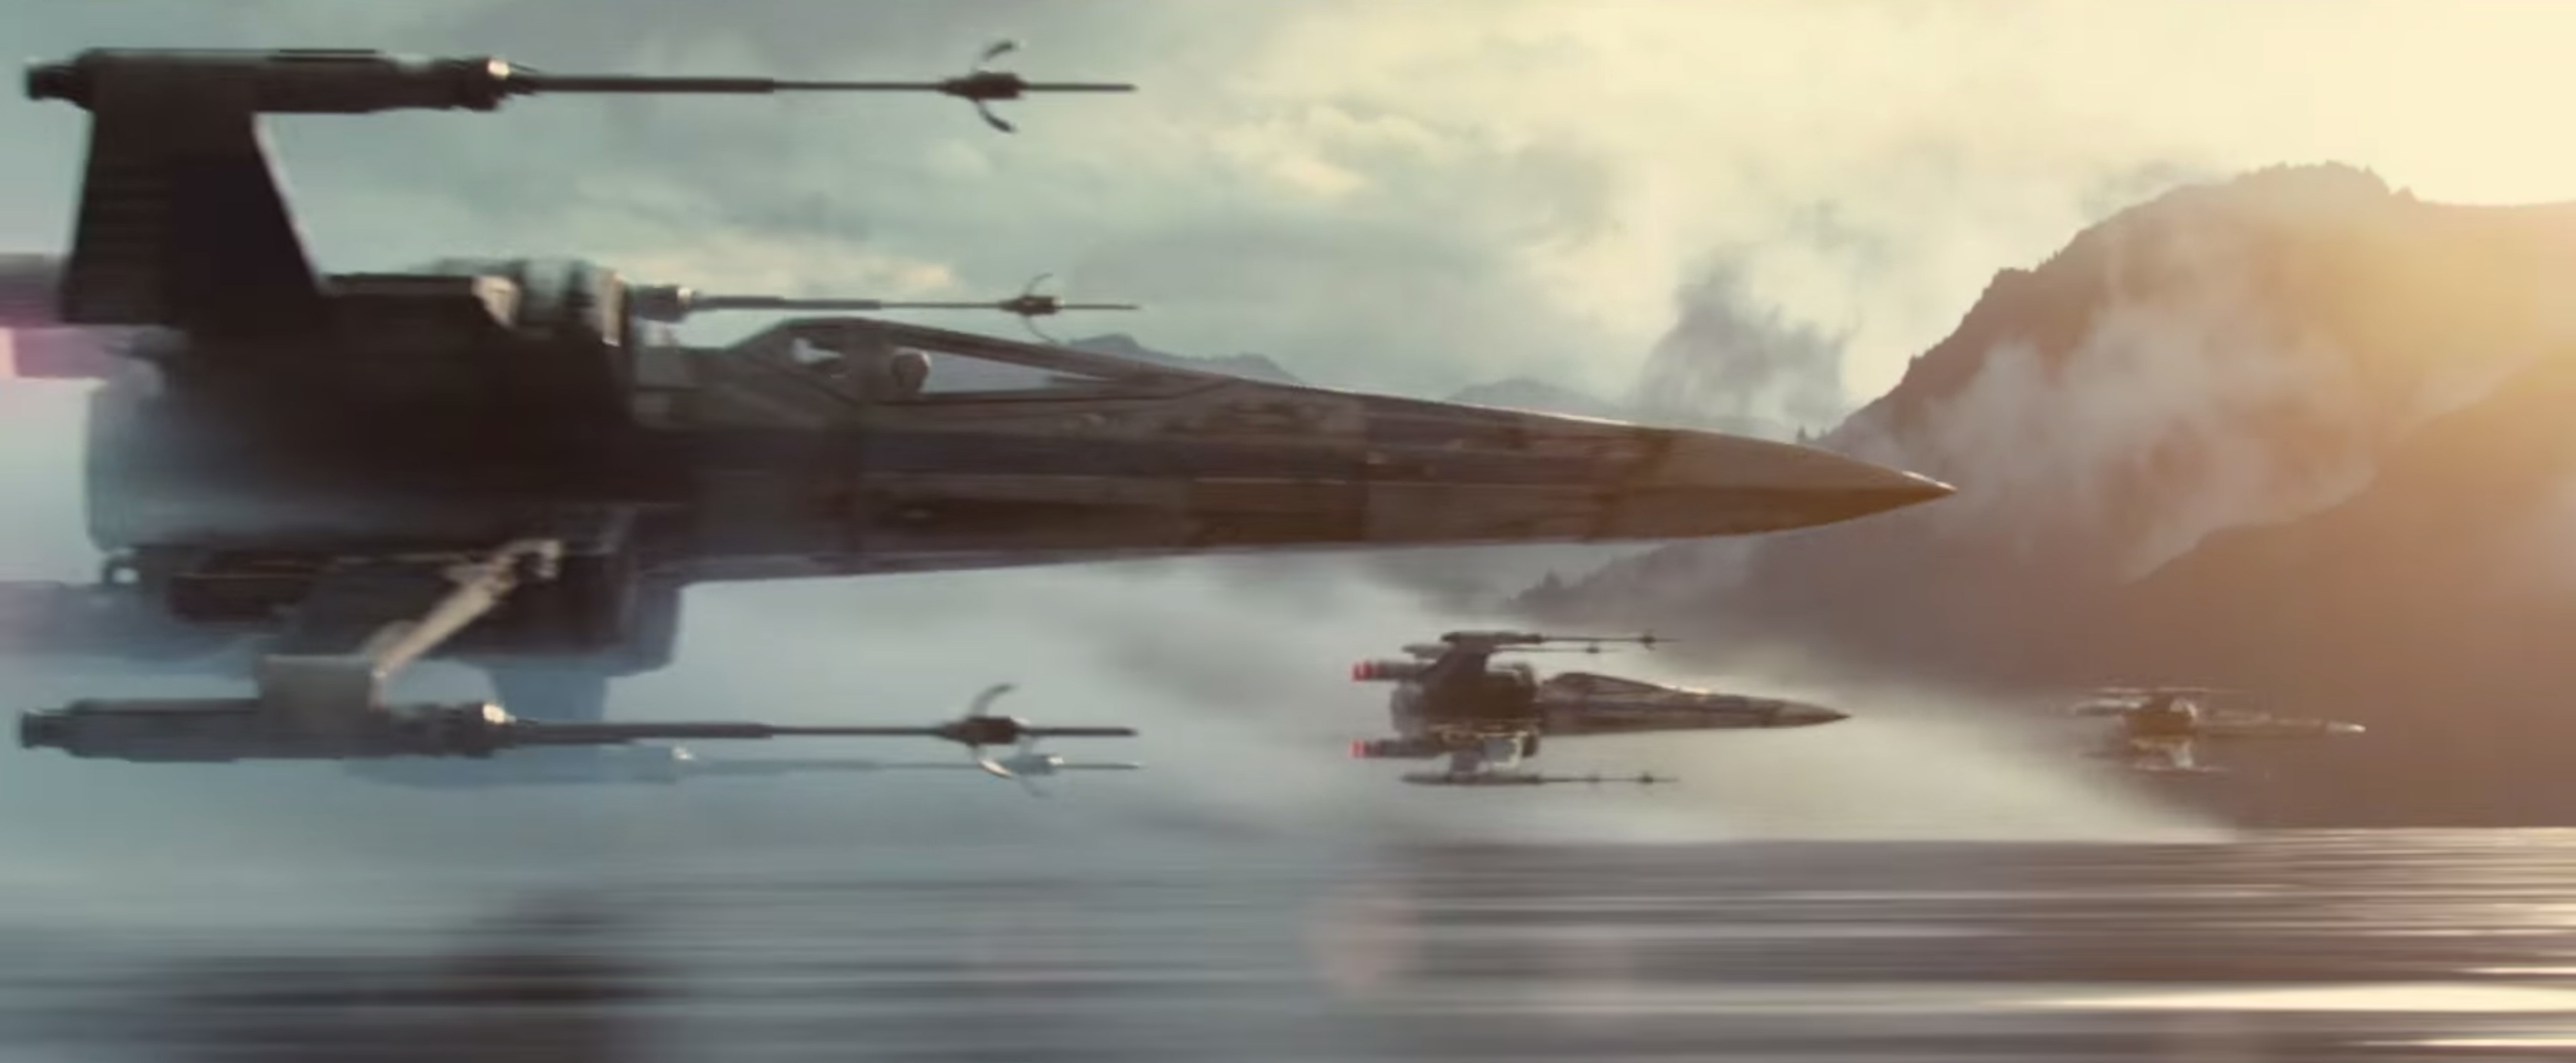 Star-Wars--Episode-VII---The-Force-Awakens